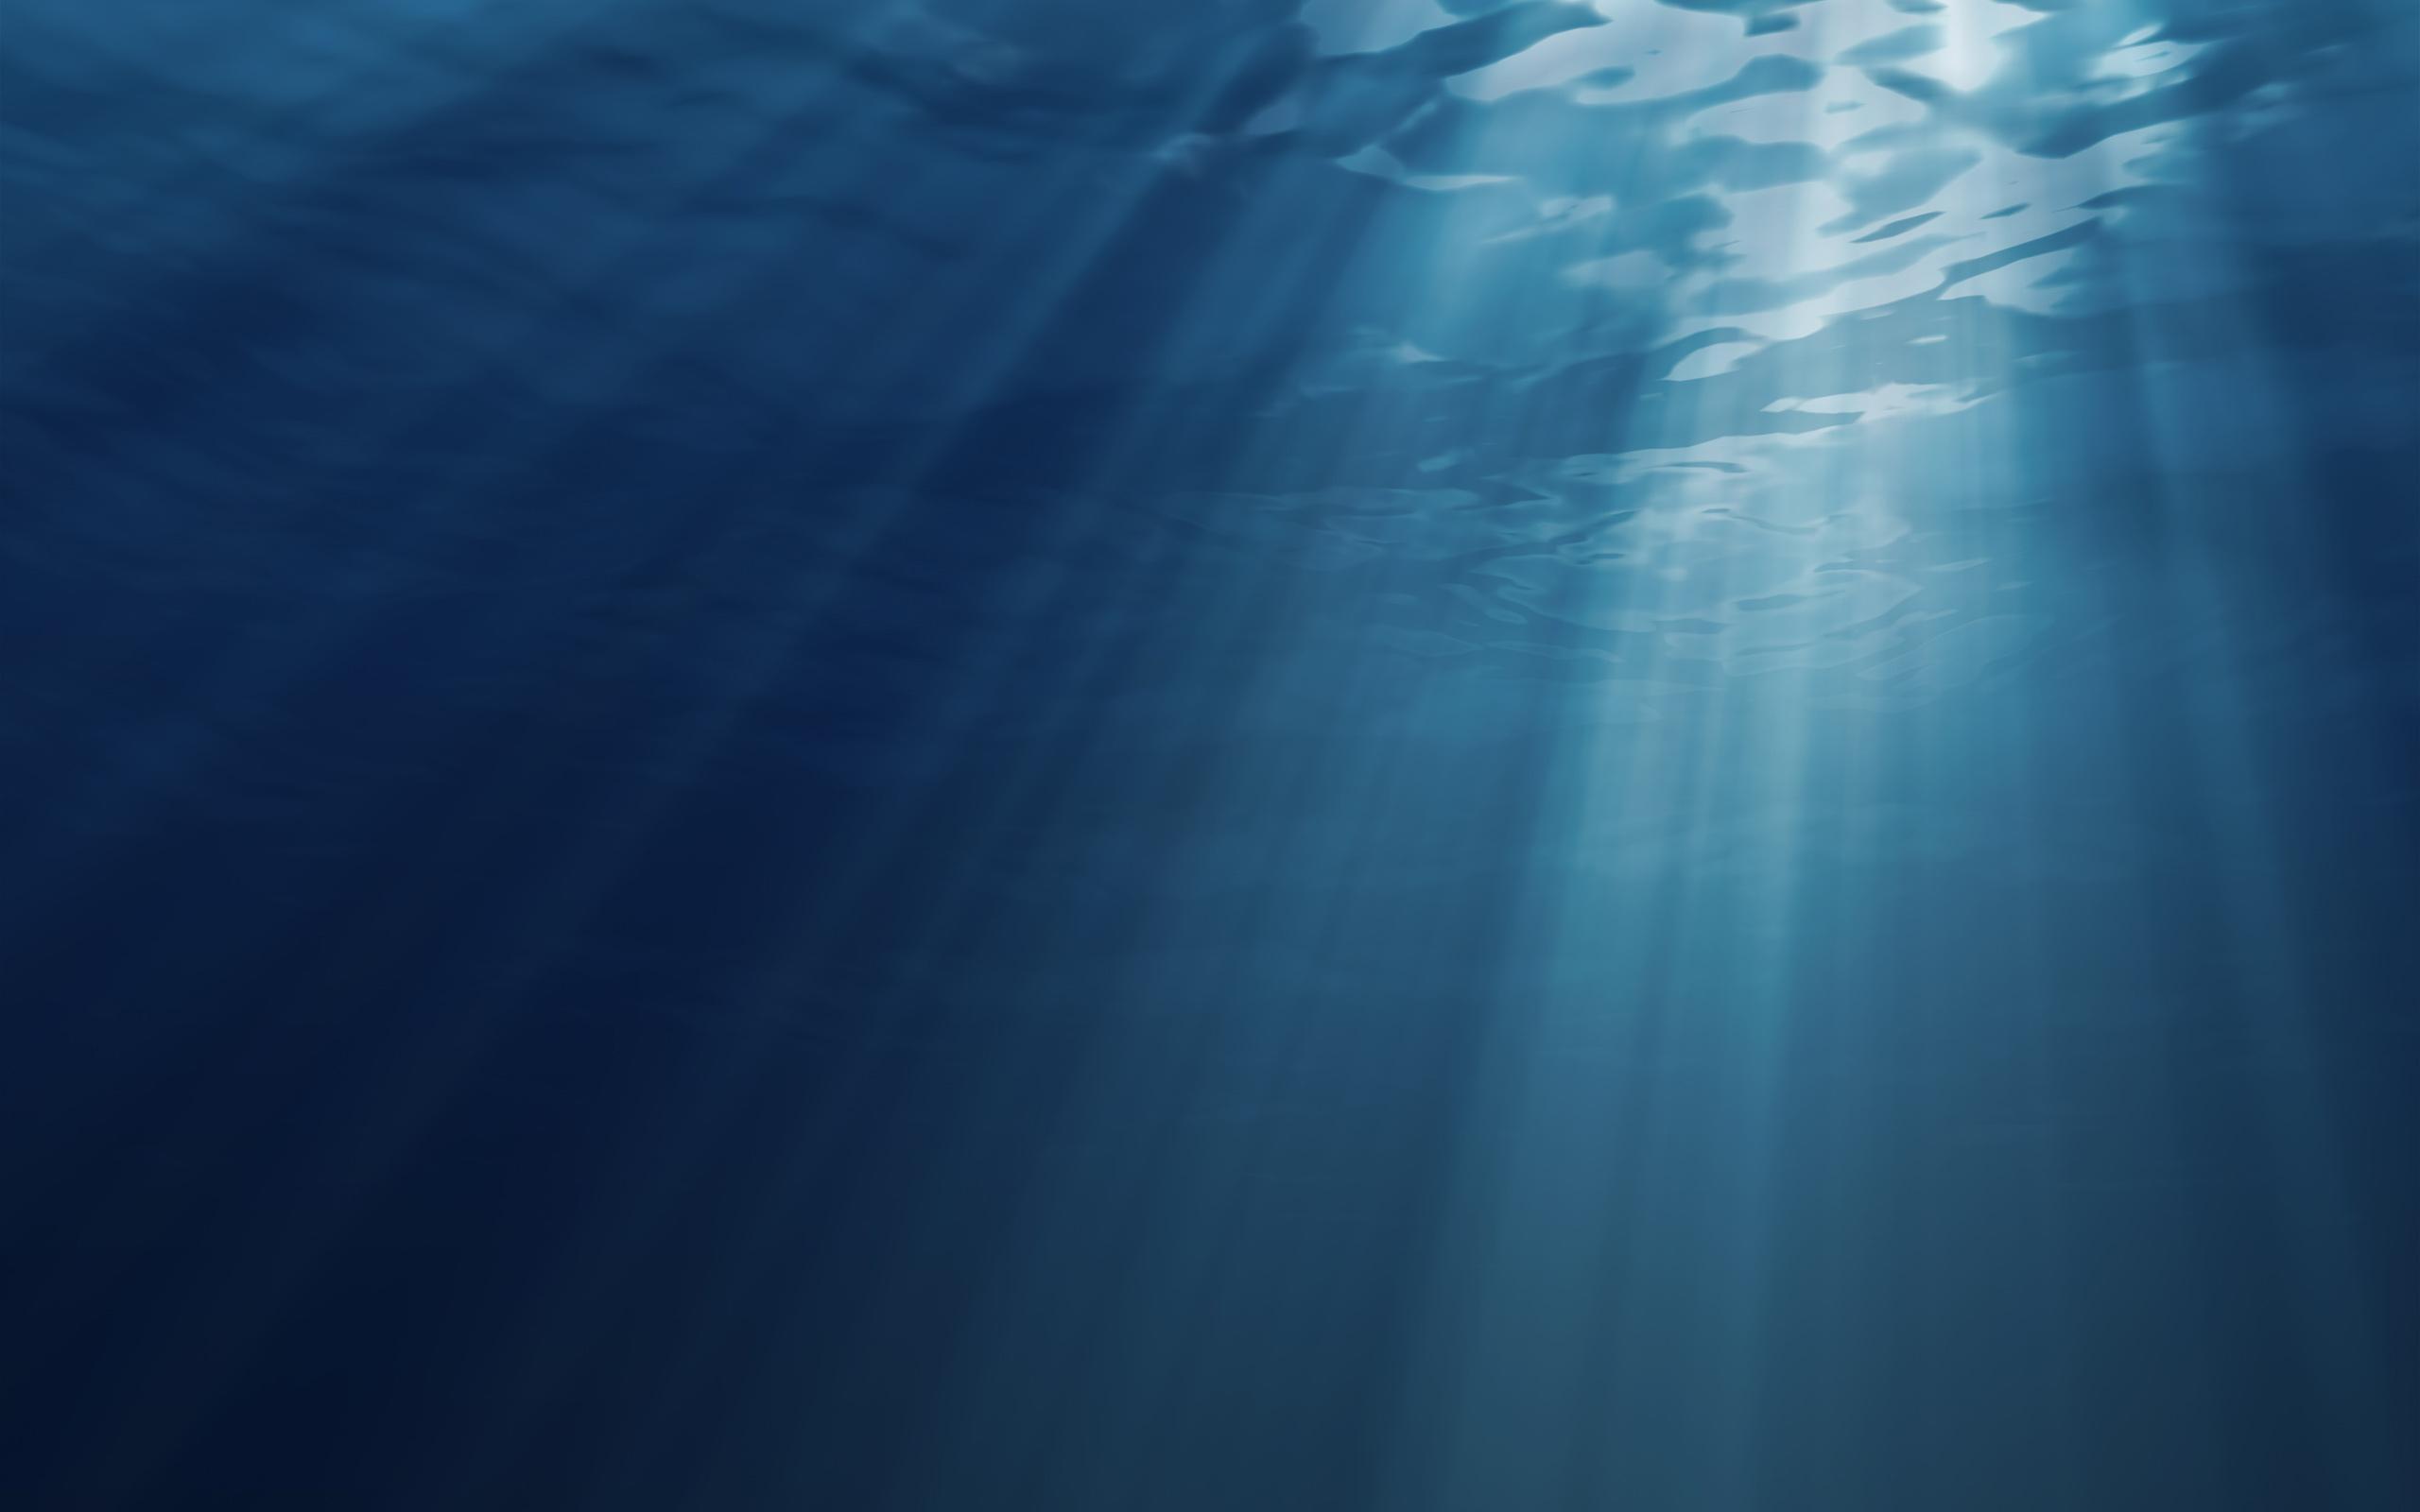 волны, вода, глубина